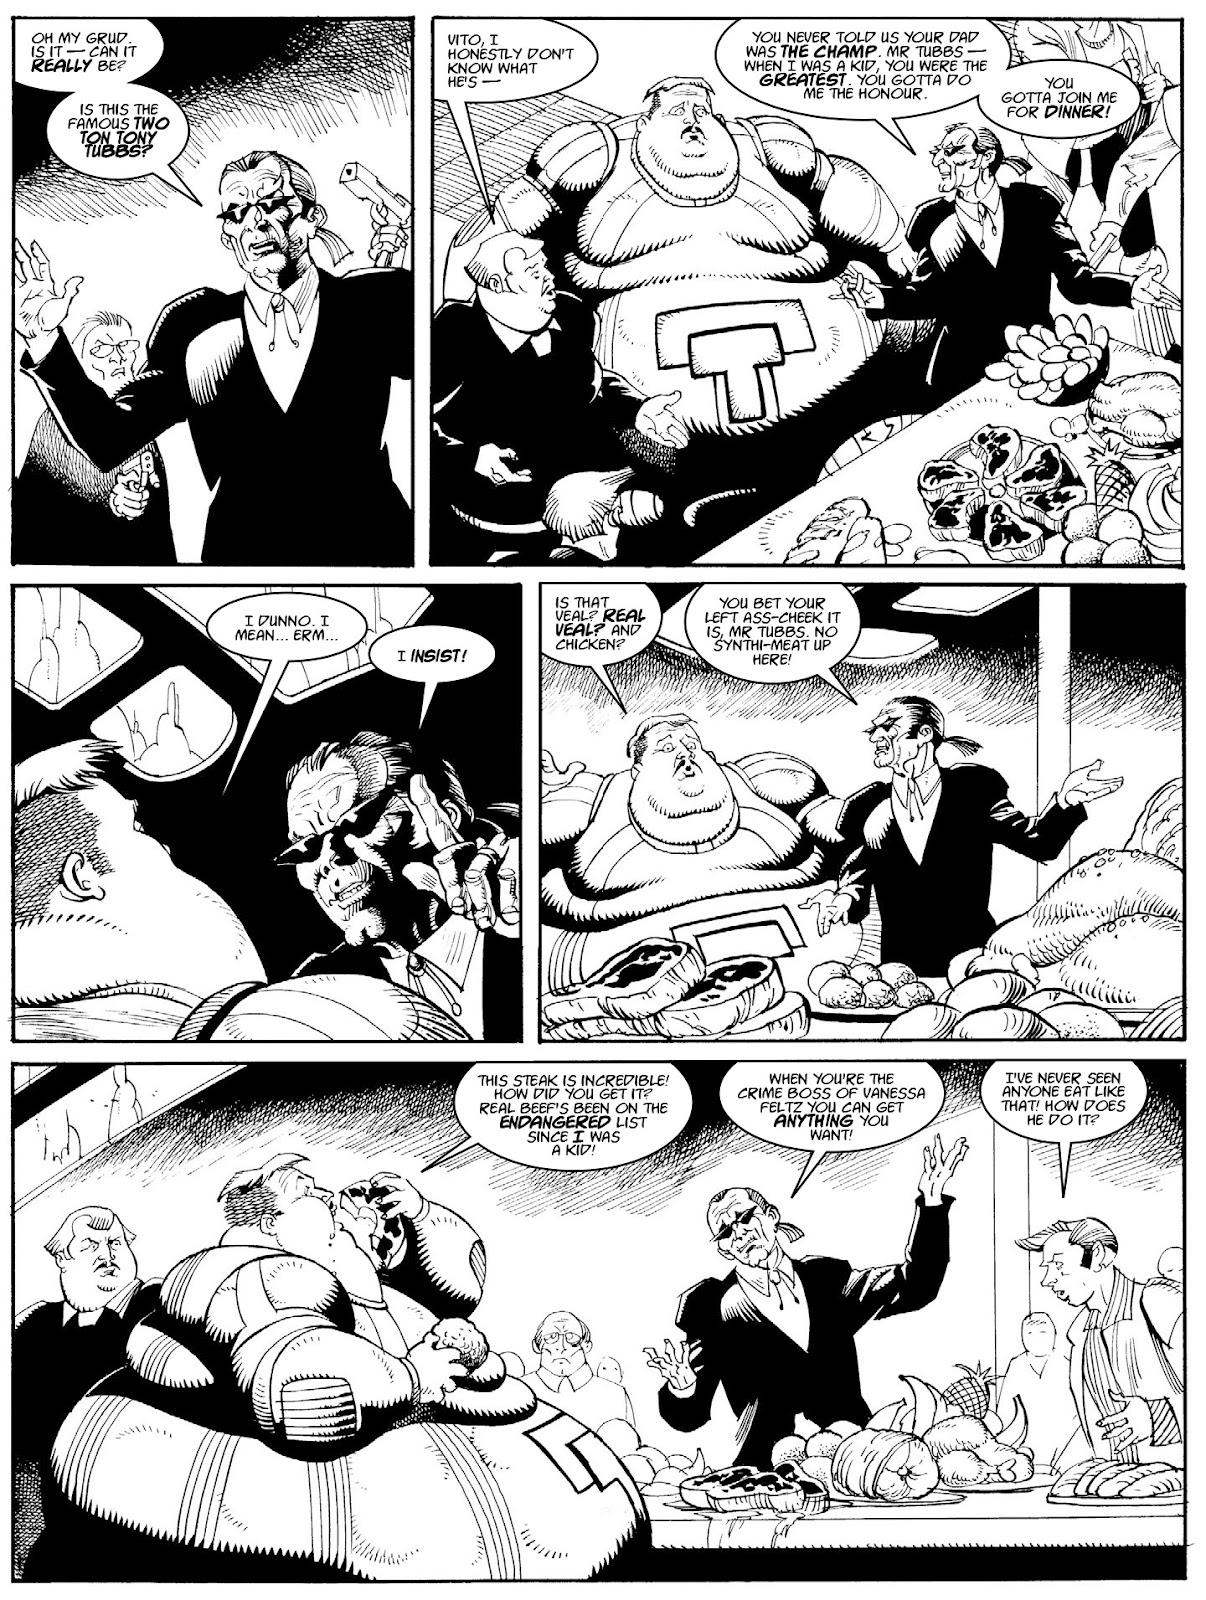 Judge Dredd Megazine (Vol. 5) issue 427 - Page 126